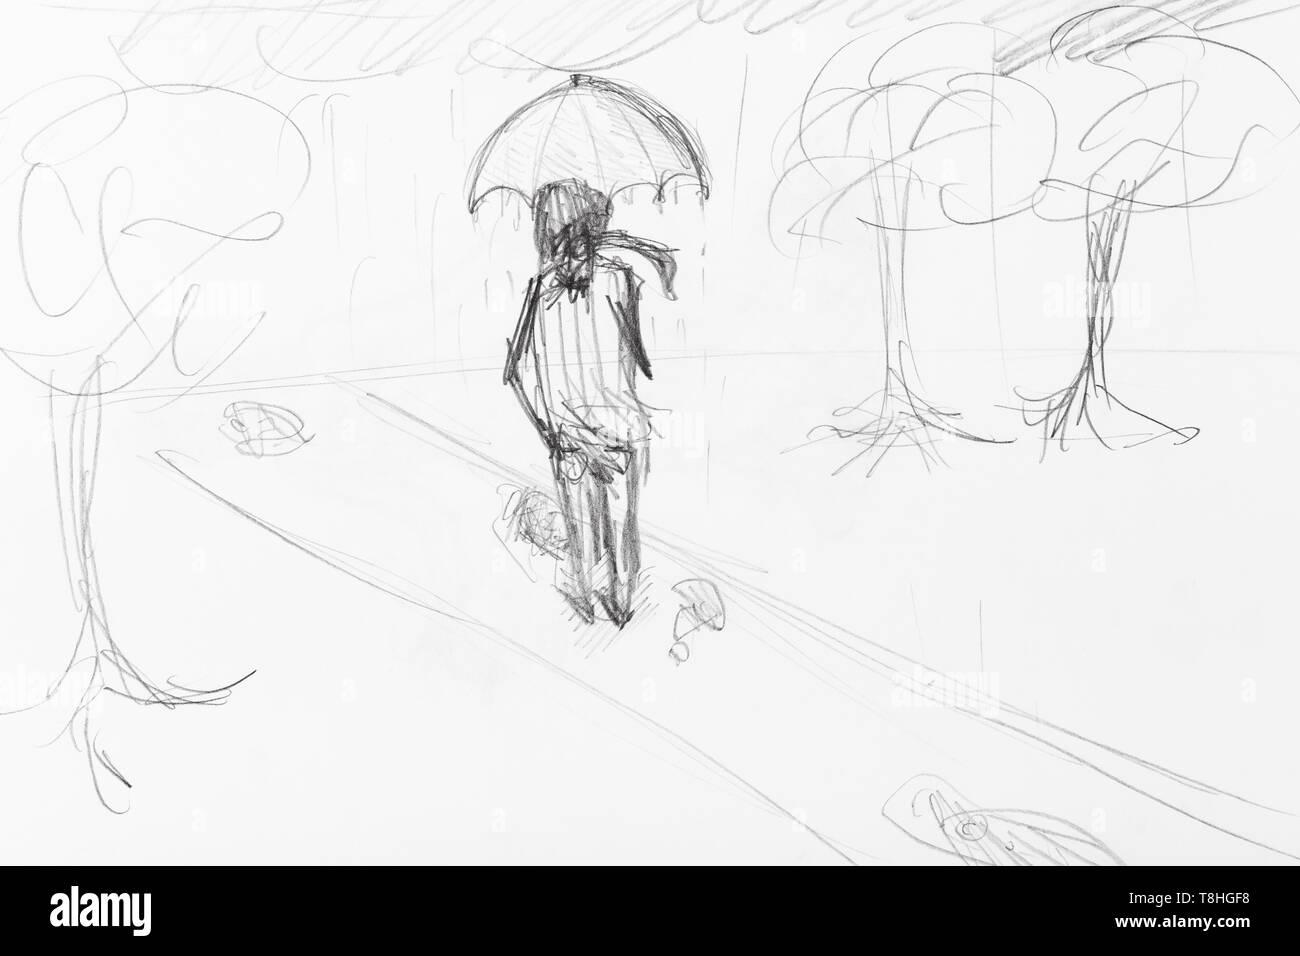 Sketch of man under umbrella walking in city park in rain